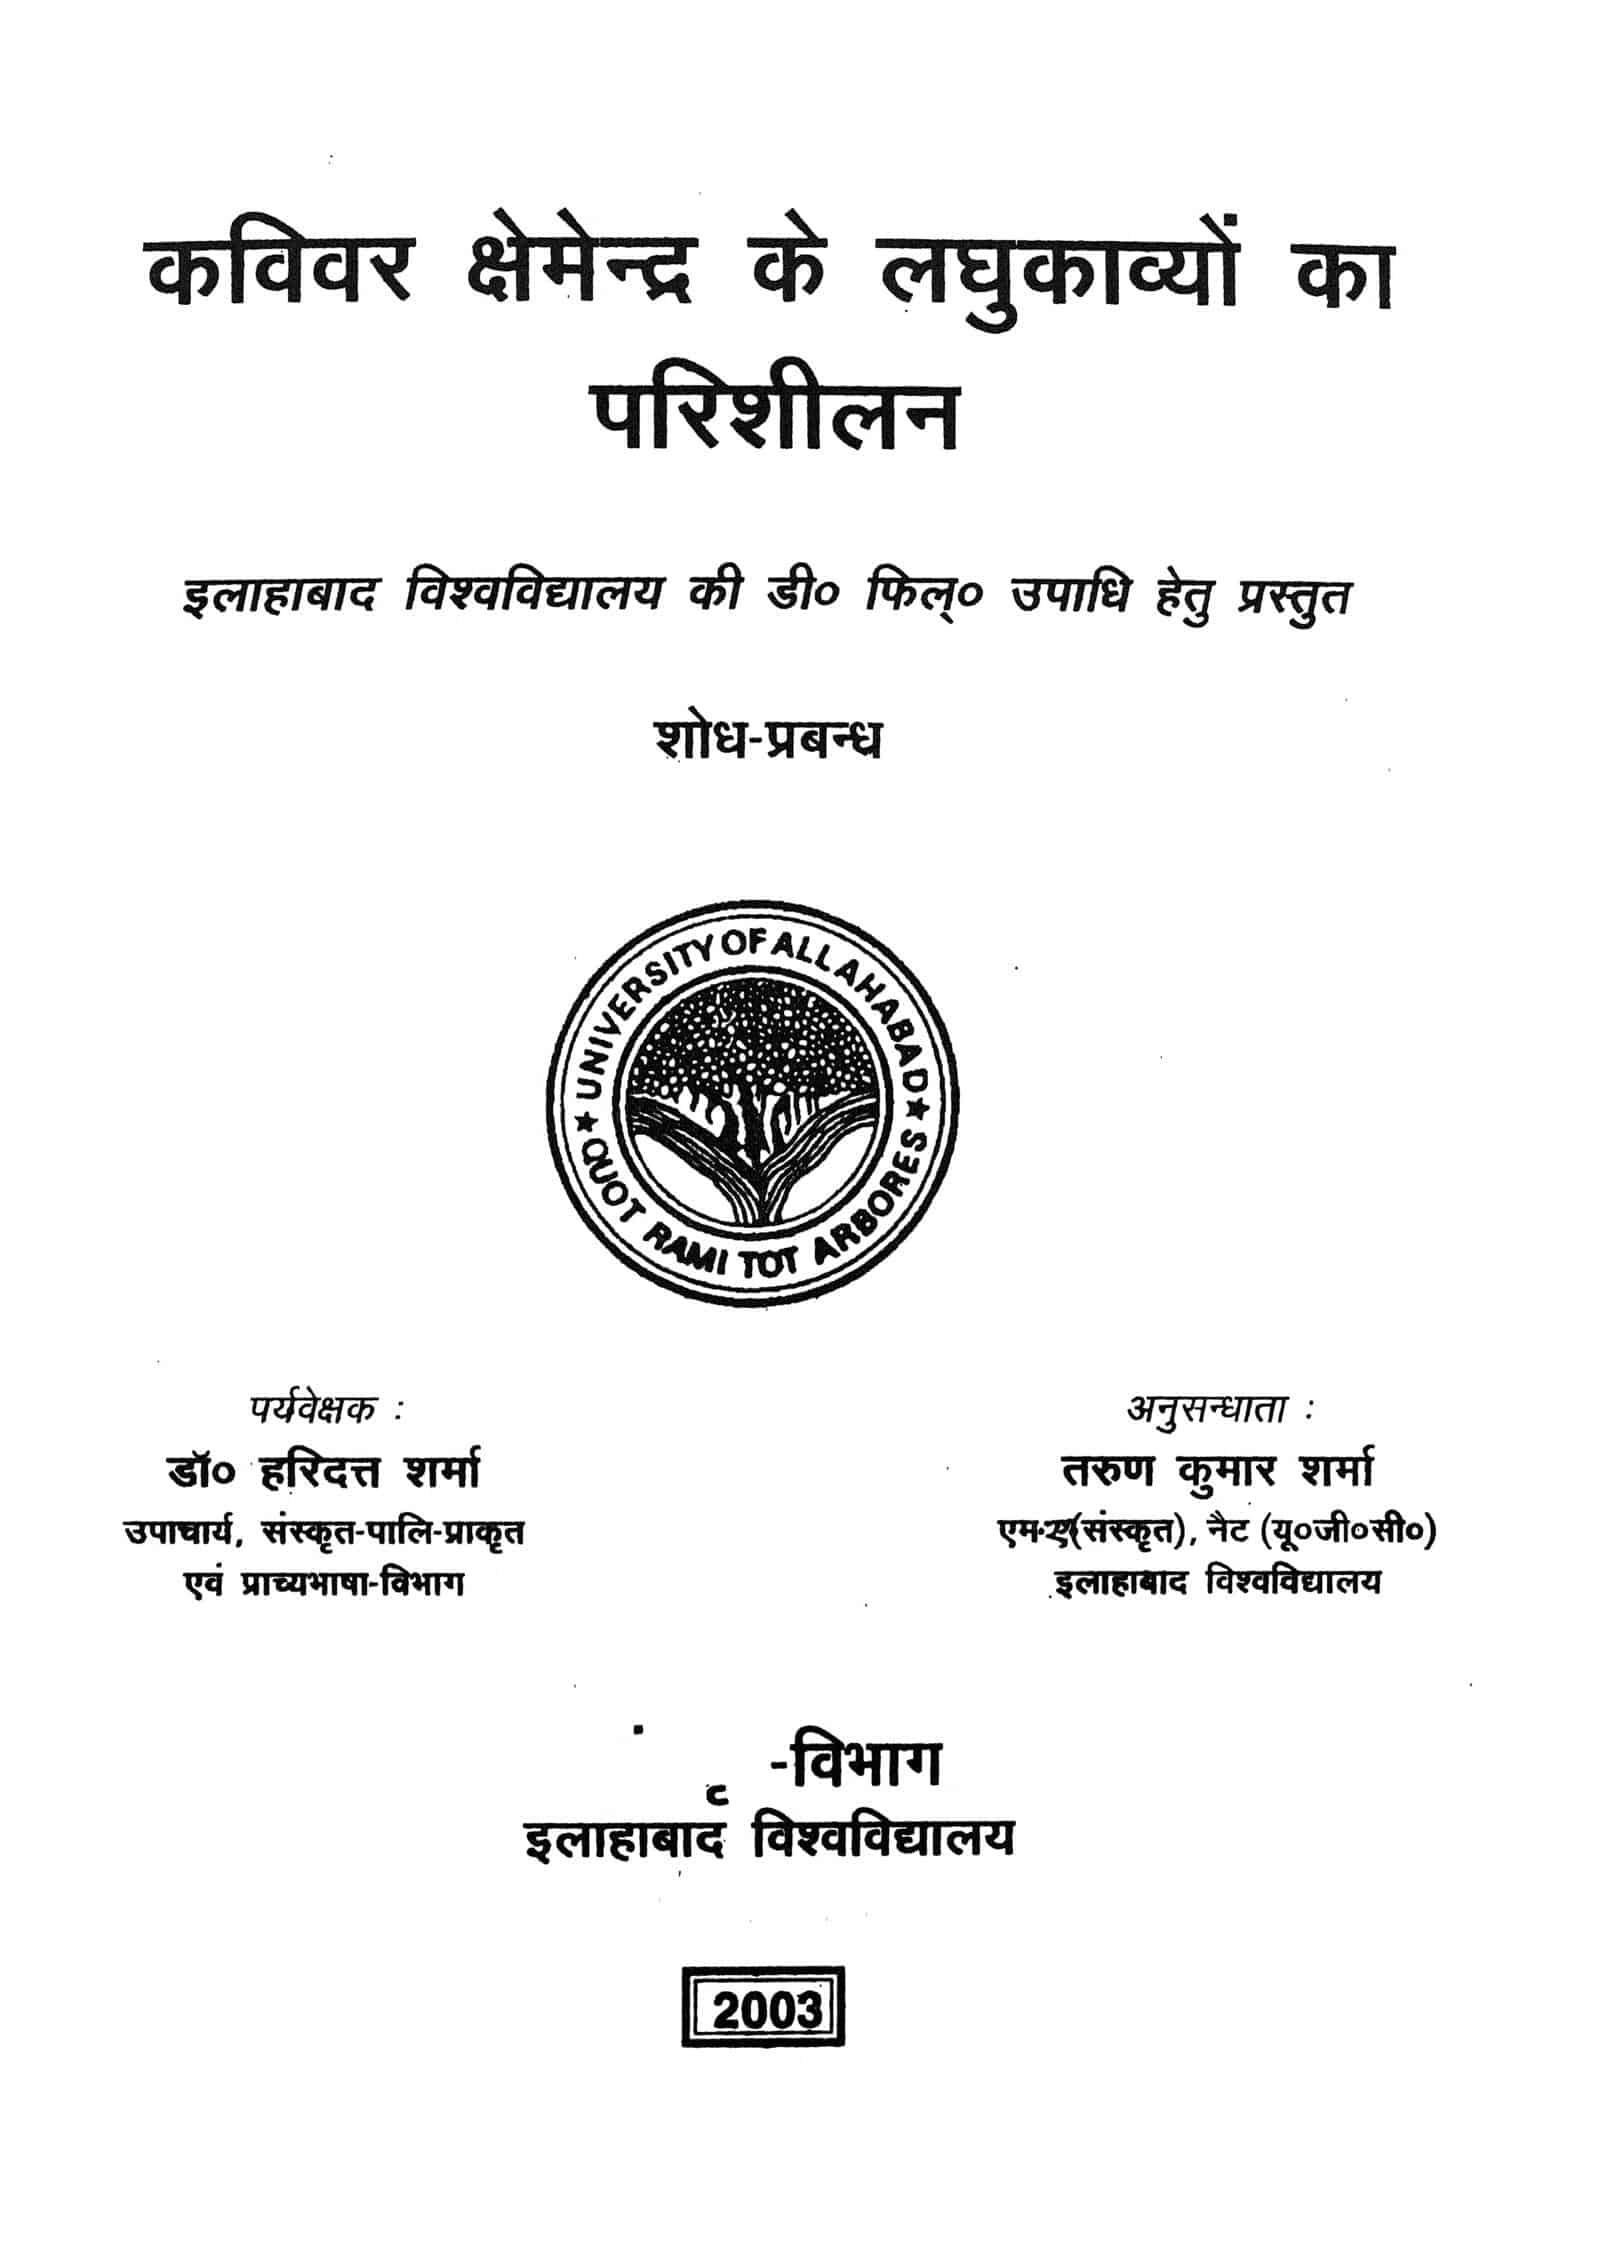 Book Image : कविवर क्षेमेन्द्र के लाघुकव्यों का परिशीलन - Kavivar Kshemendra Ke Laghukavyon Ka Parishilan